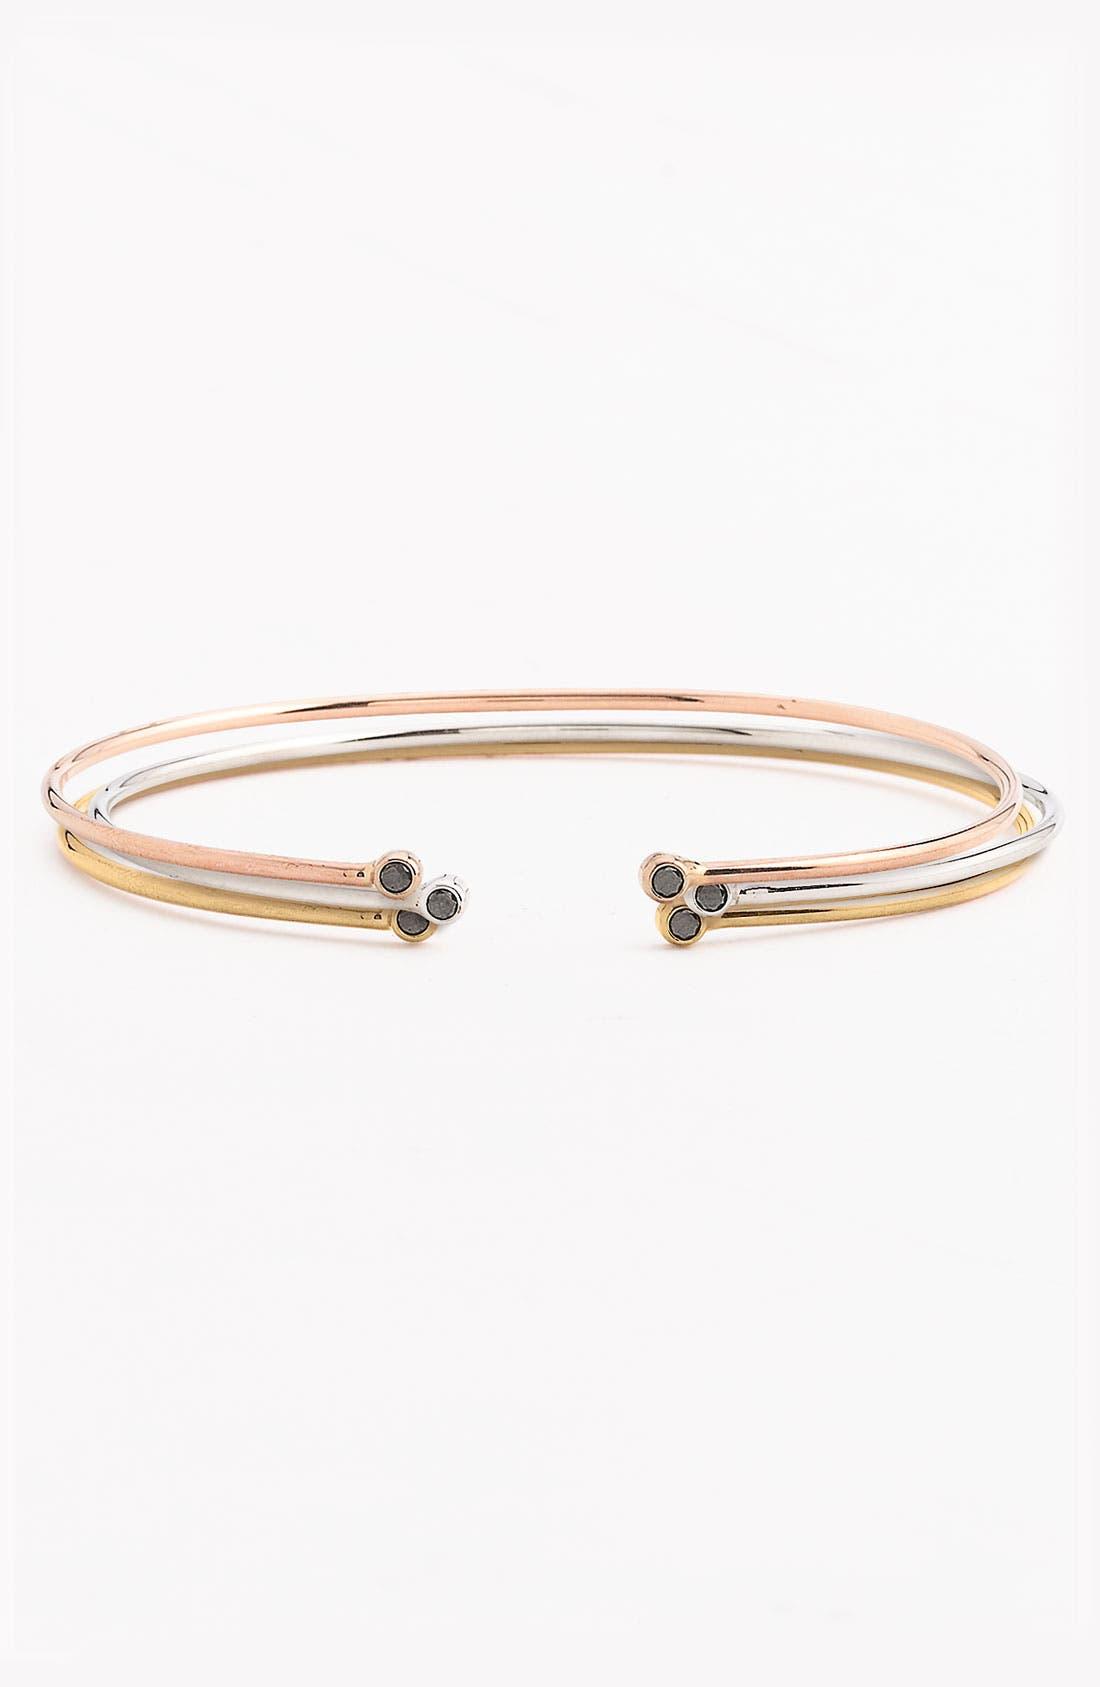 Alternate Image 1 Selected - Lana Jewelry 'Echo' Black Diamond Bracelet (Nordstrom Exclusive)